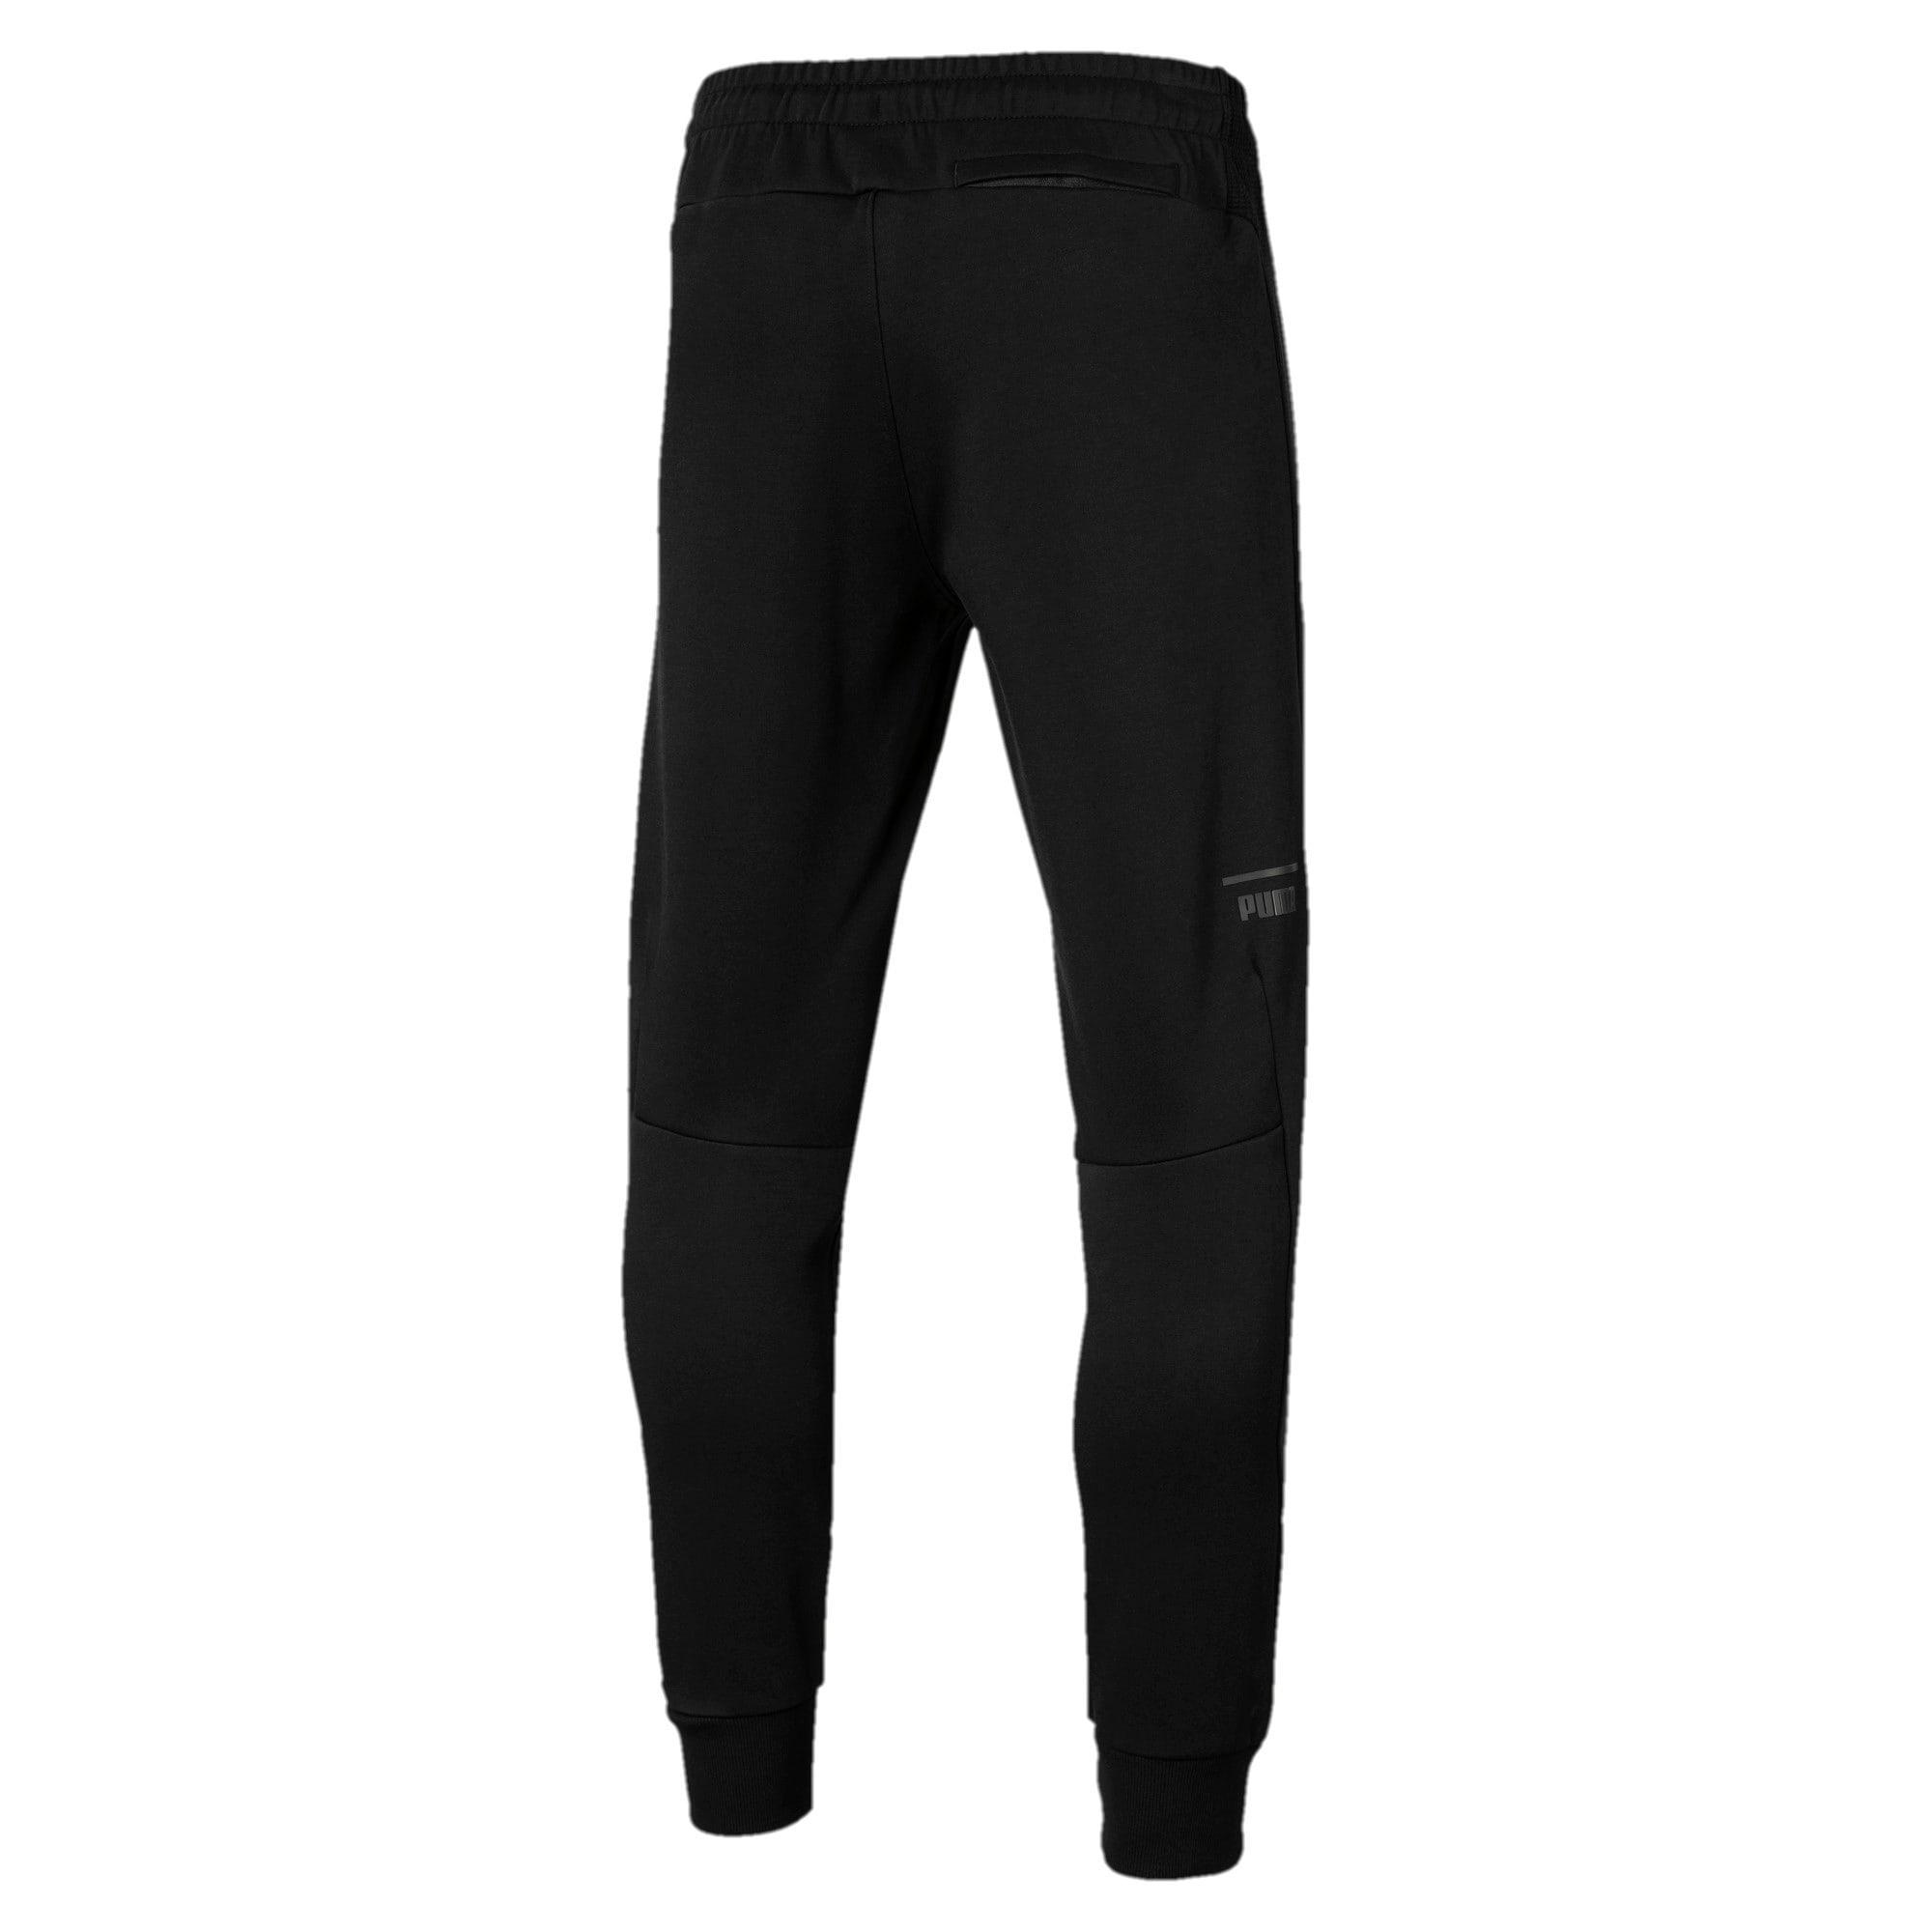 Thumbnail 5 of Pace Men's Sweatpants, Puma Black-1, medium-IND